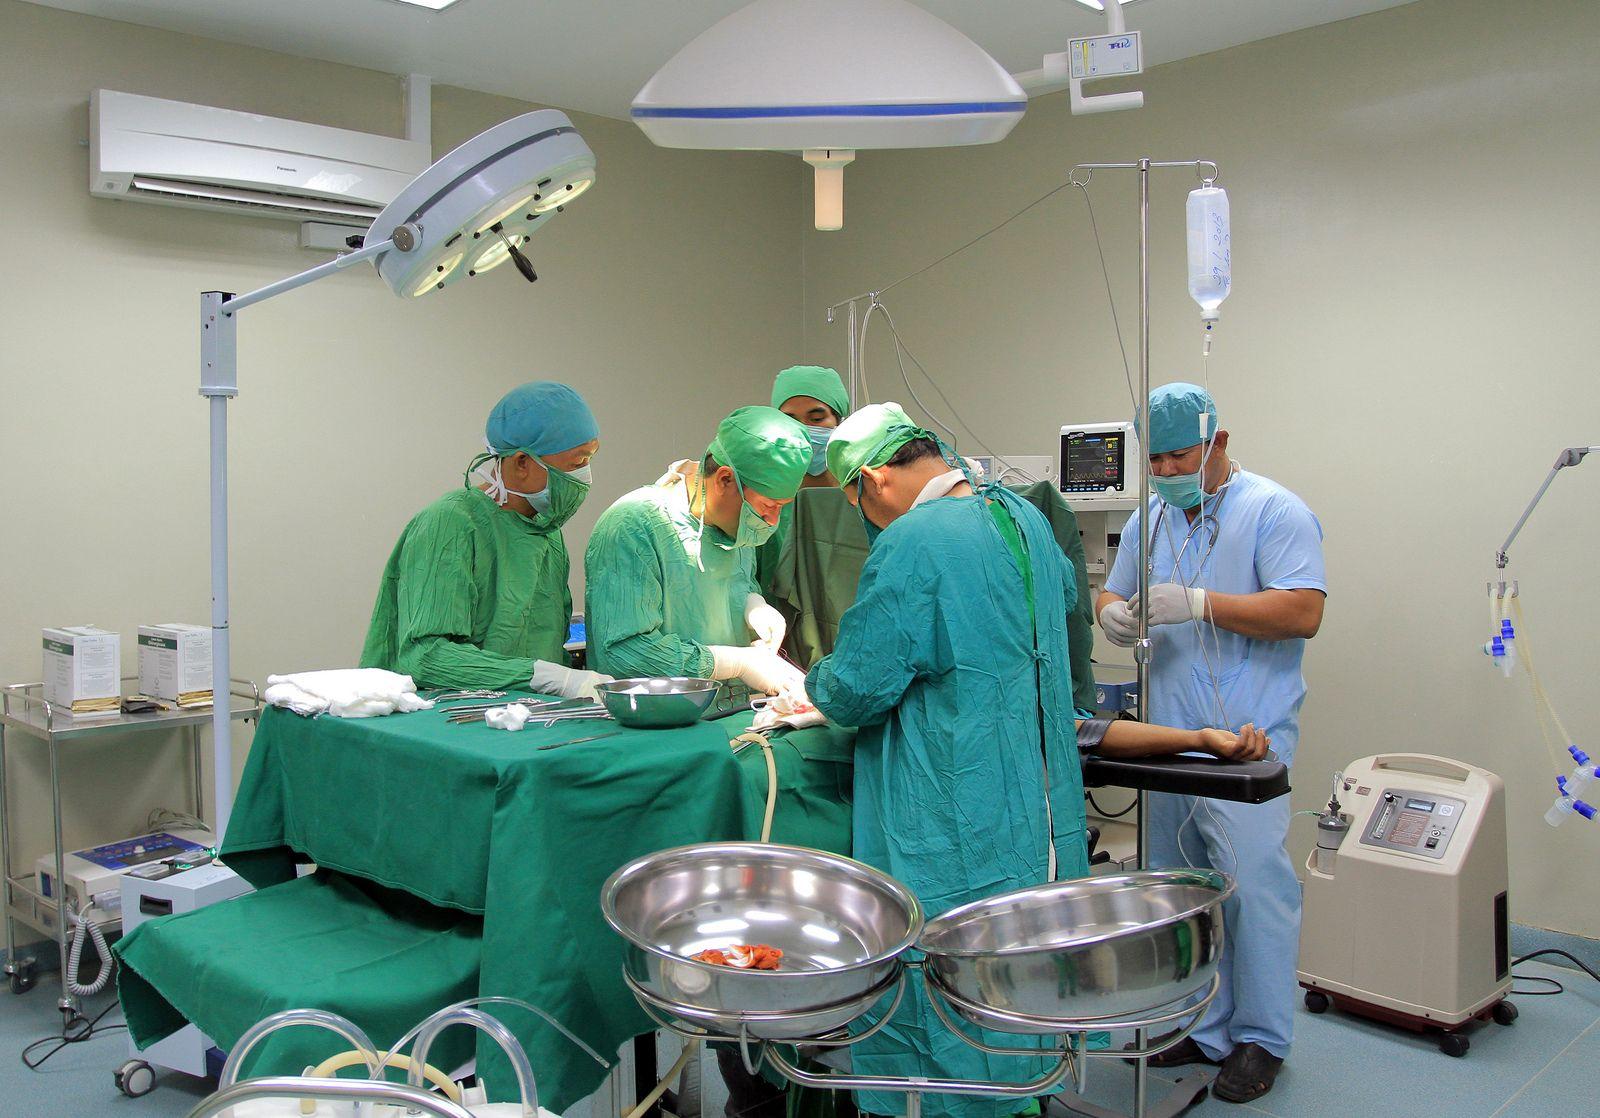 Physicians & surgeons | Data USA